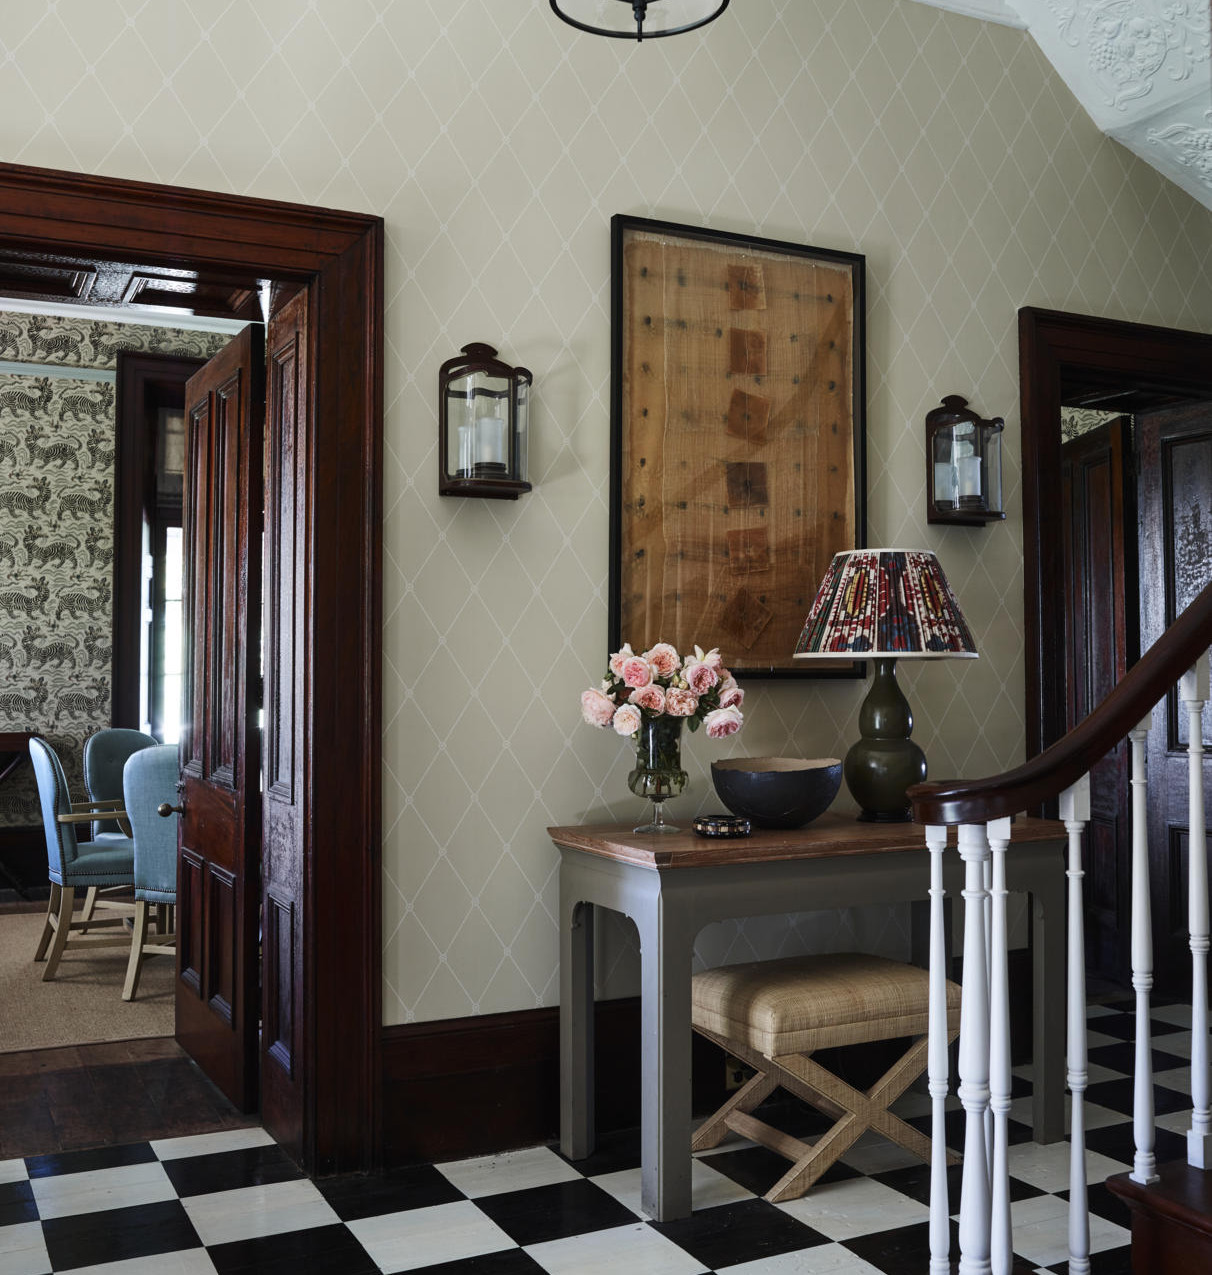 The Entrance Foyer